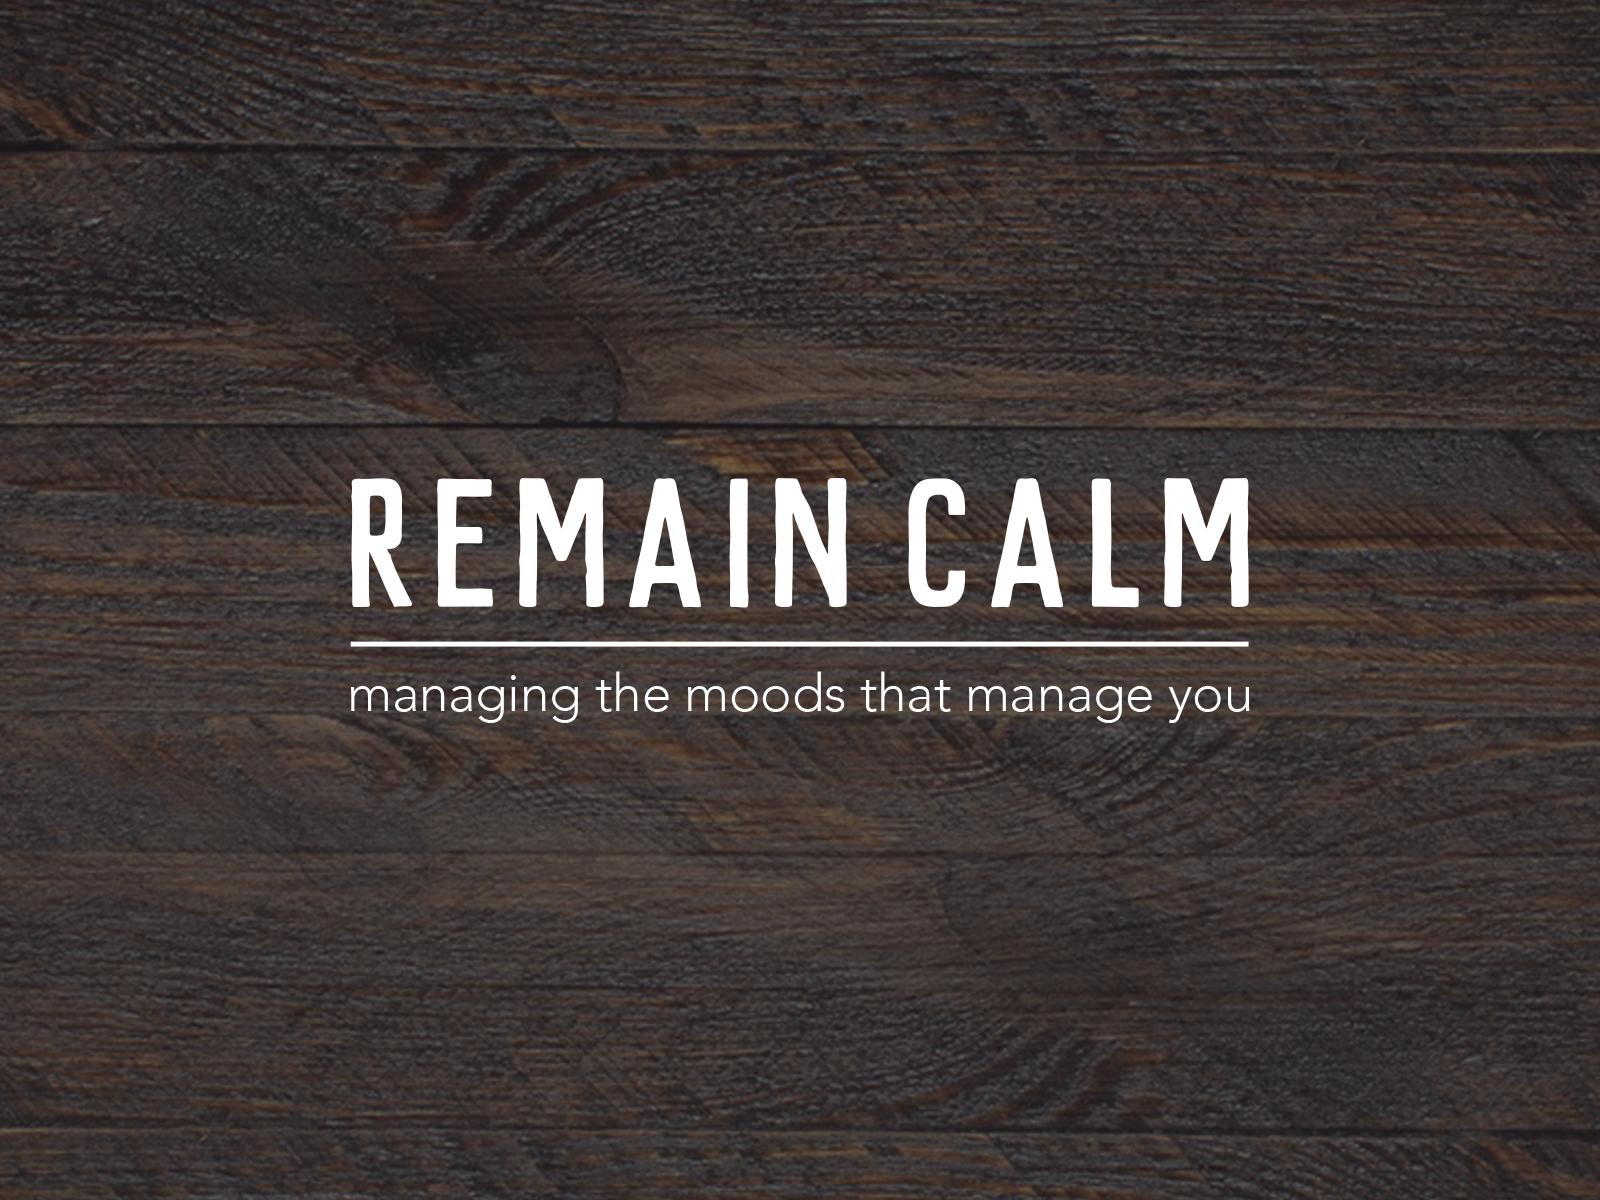 Wallpaper_Desktop_Standard_Remain_Calm.png